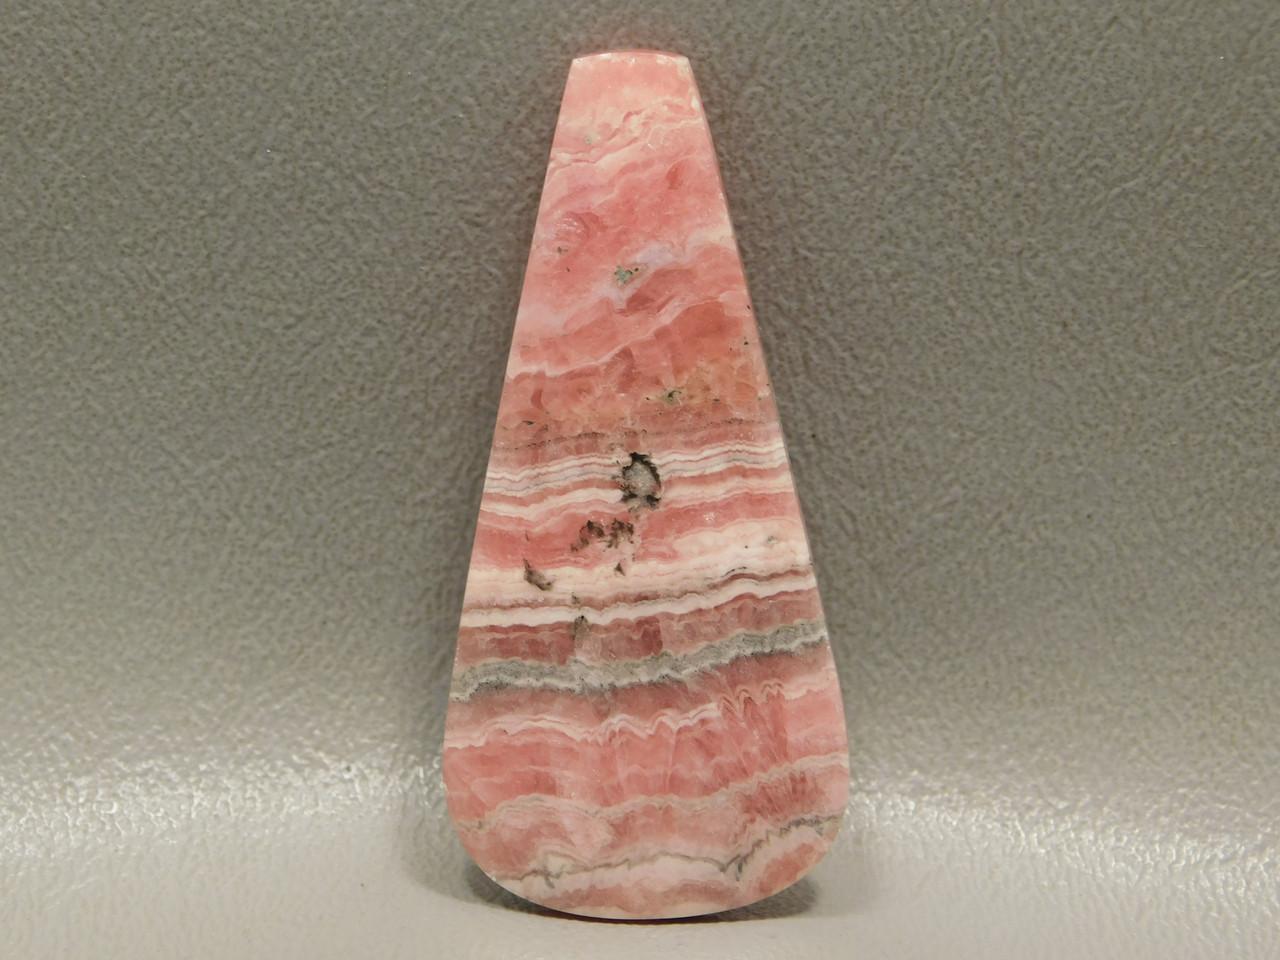 Rhodochrosite Pink Stone Cabochon Large Tongue Drop Shape #6